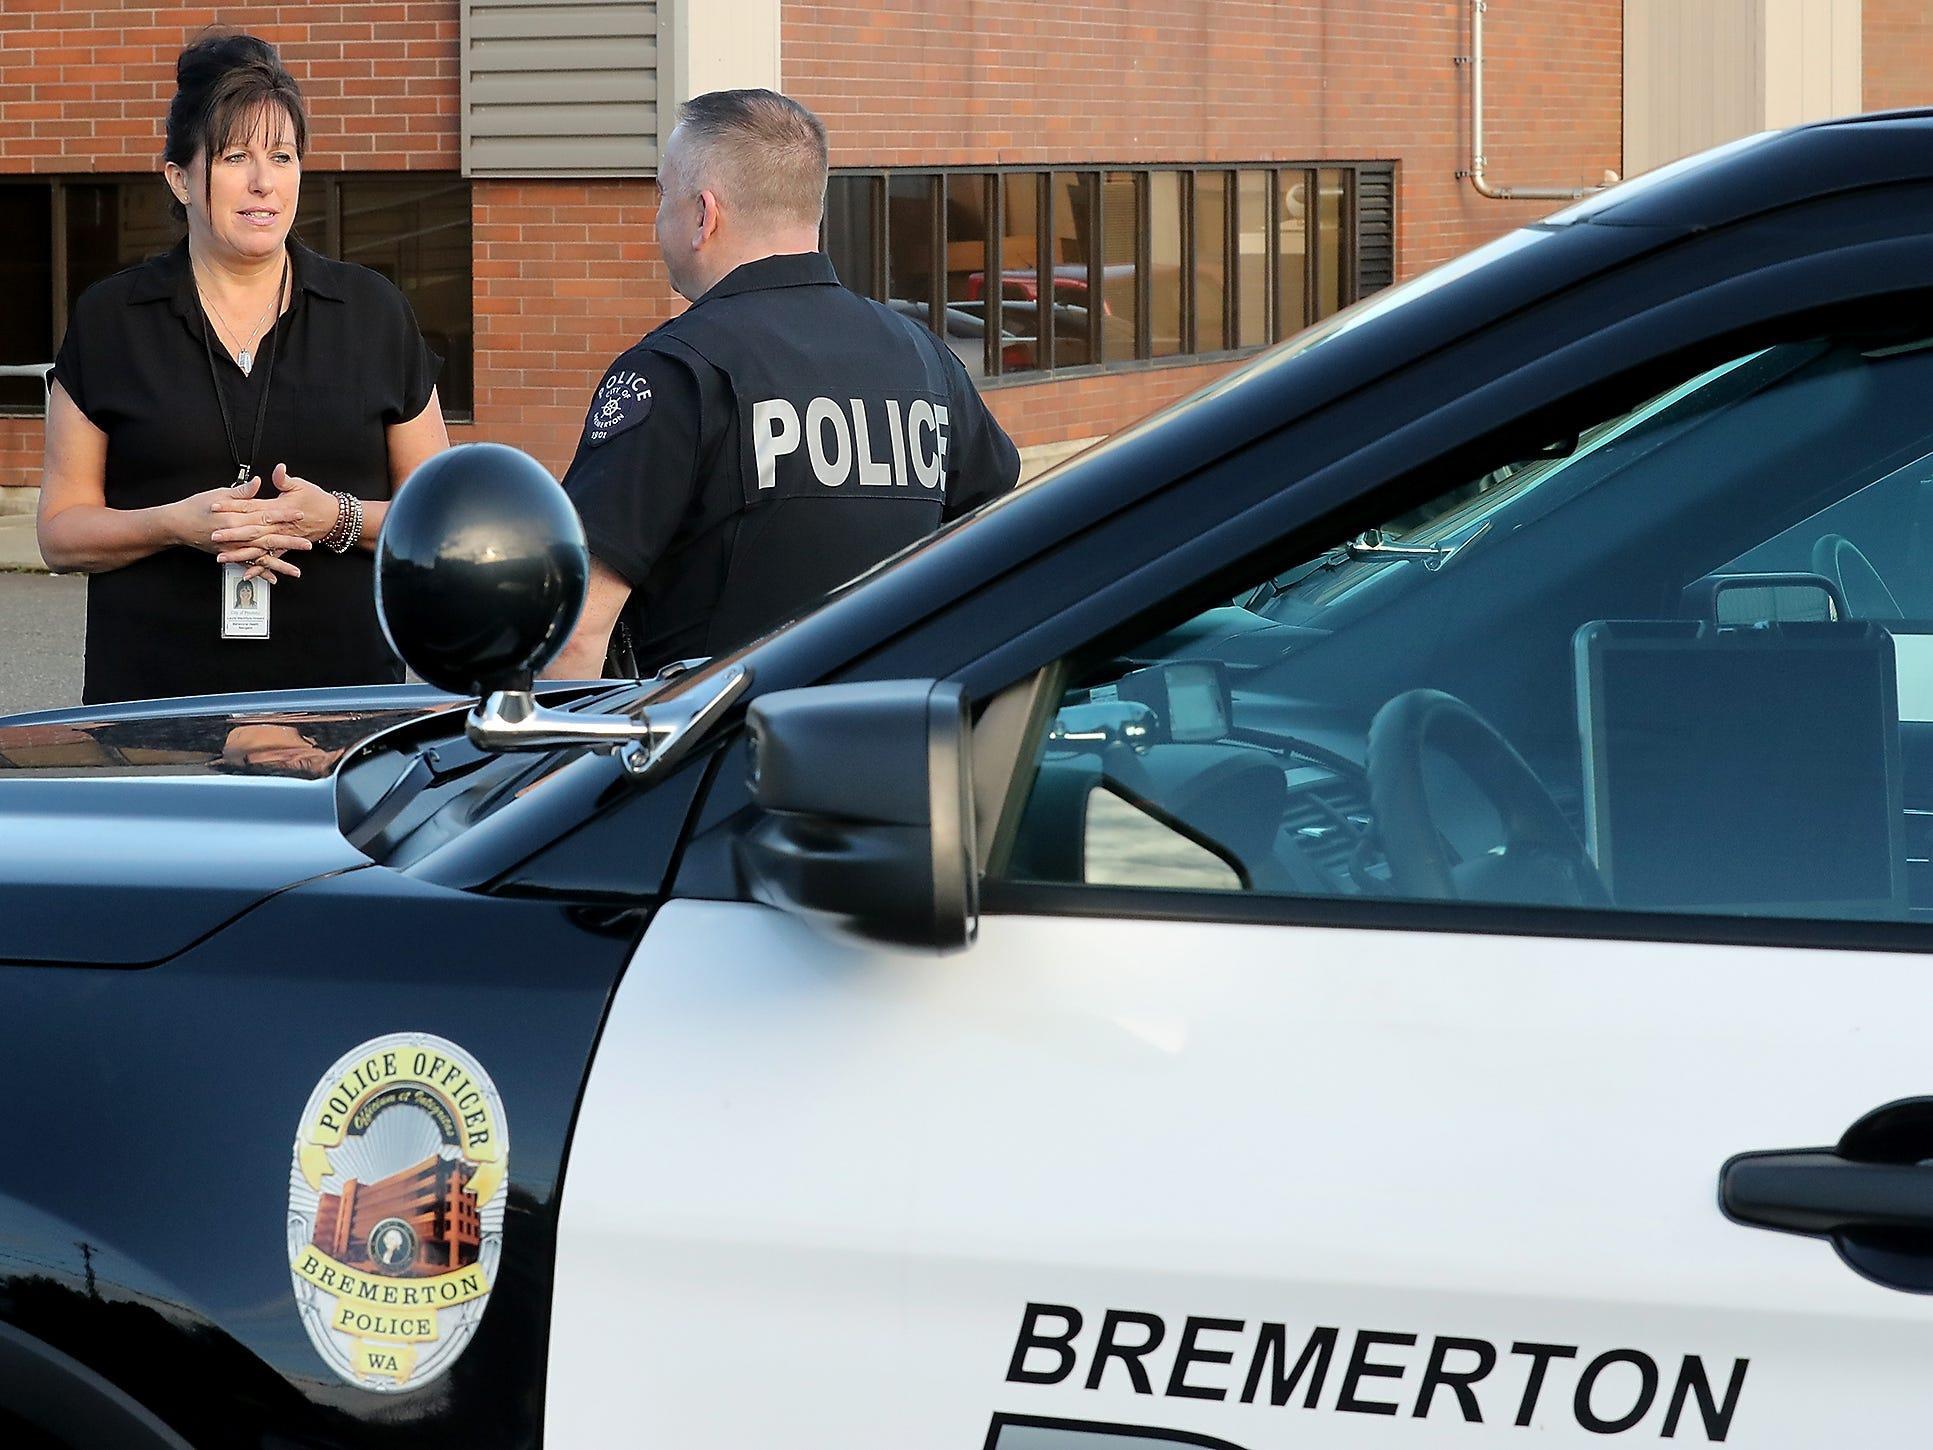 Behavioral Health Navigator Laurel MacIntyre-Howard talks with Capt. Randy Plumb at the Bremerton Police Department on Friday, November 16, 2018.